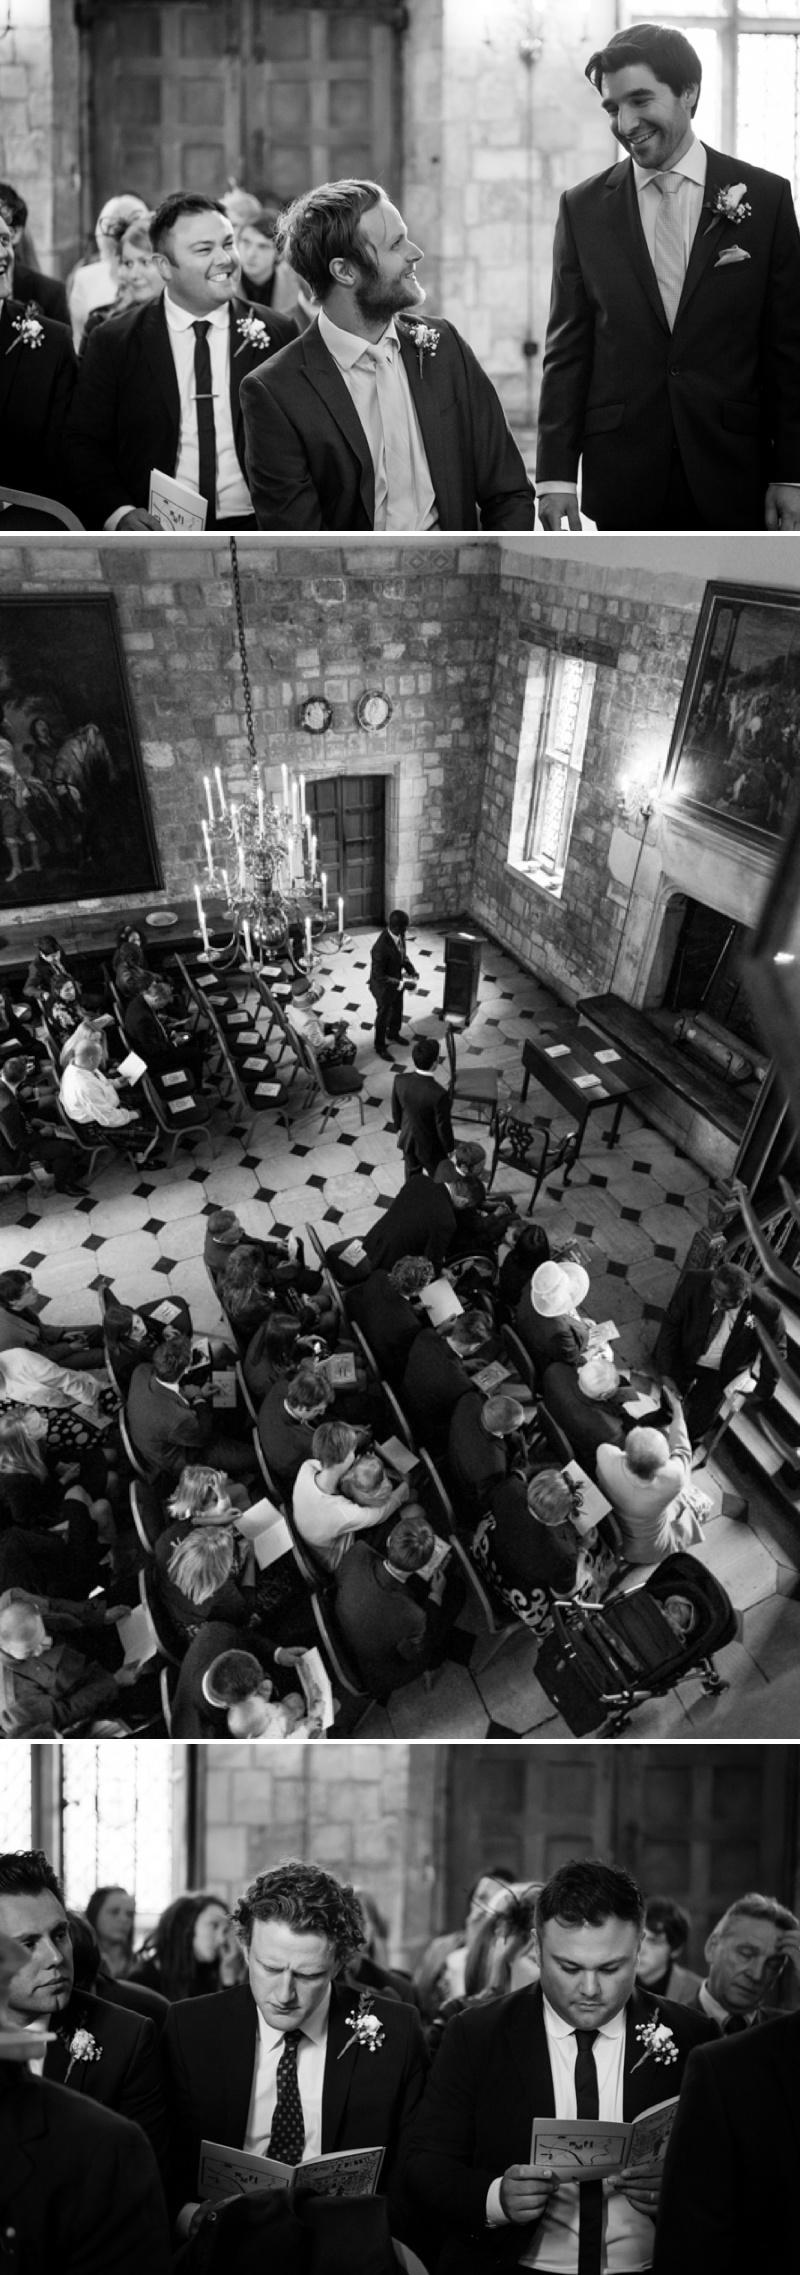 The Treasurers House Wedding Civil Ceremony Venue York Yorkshire